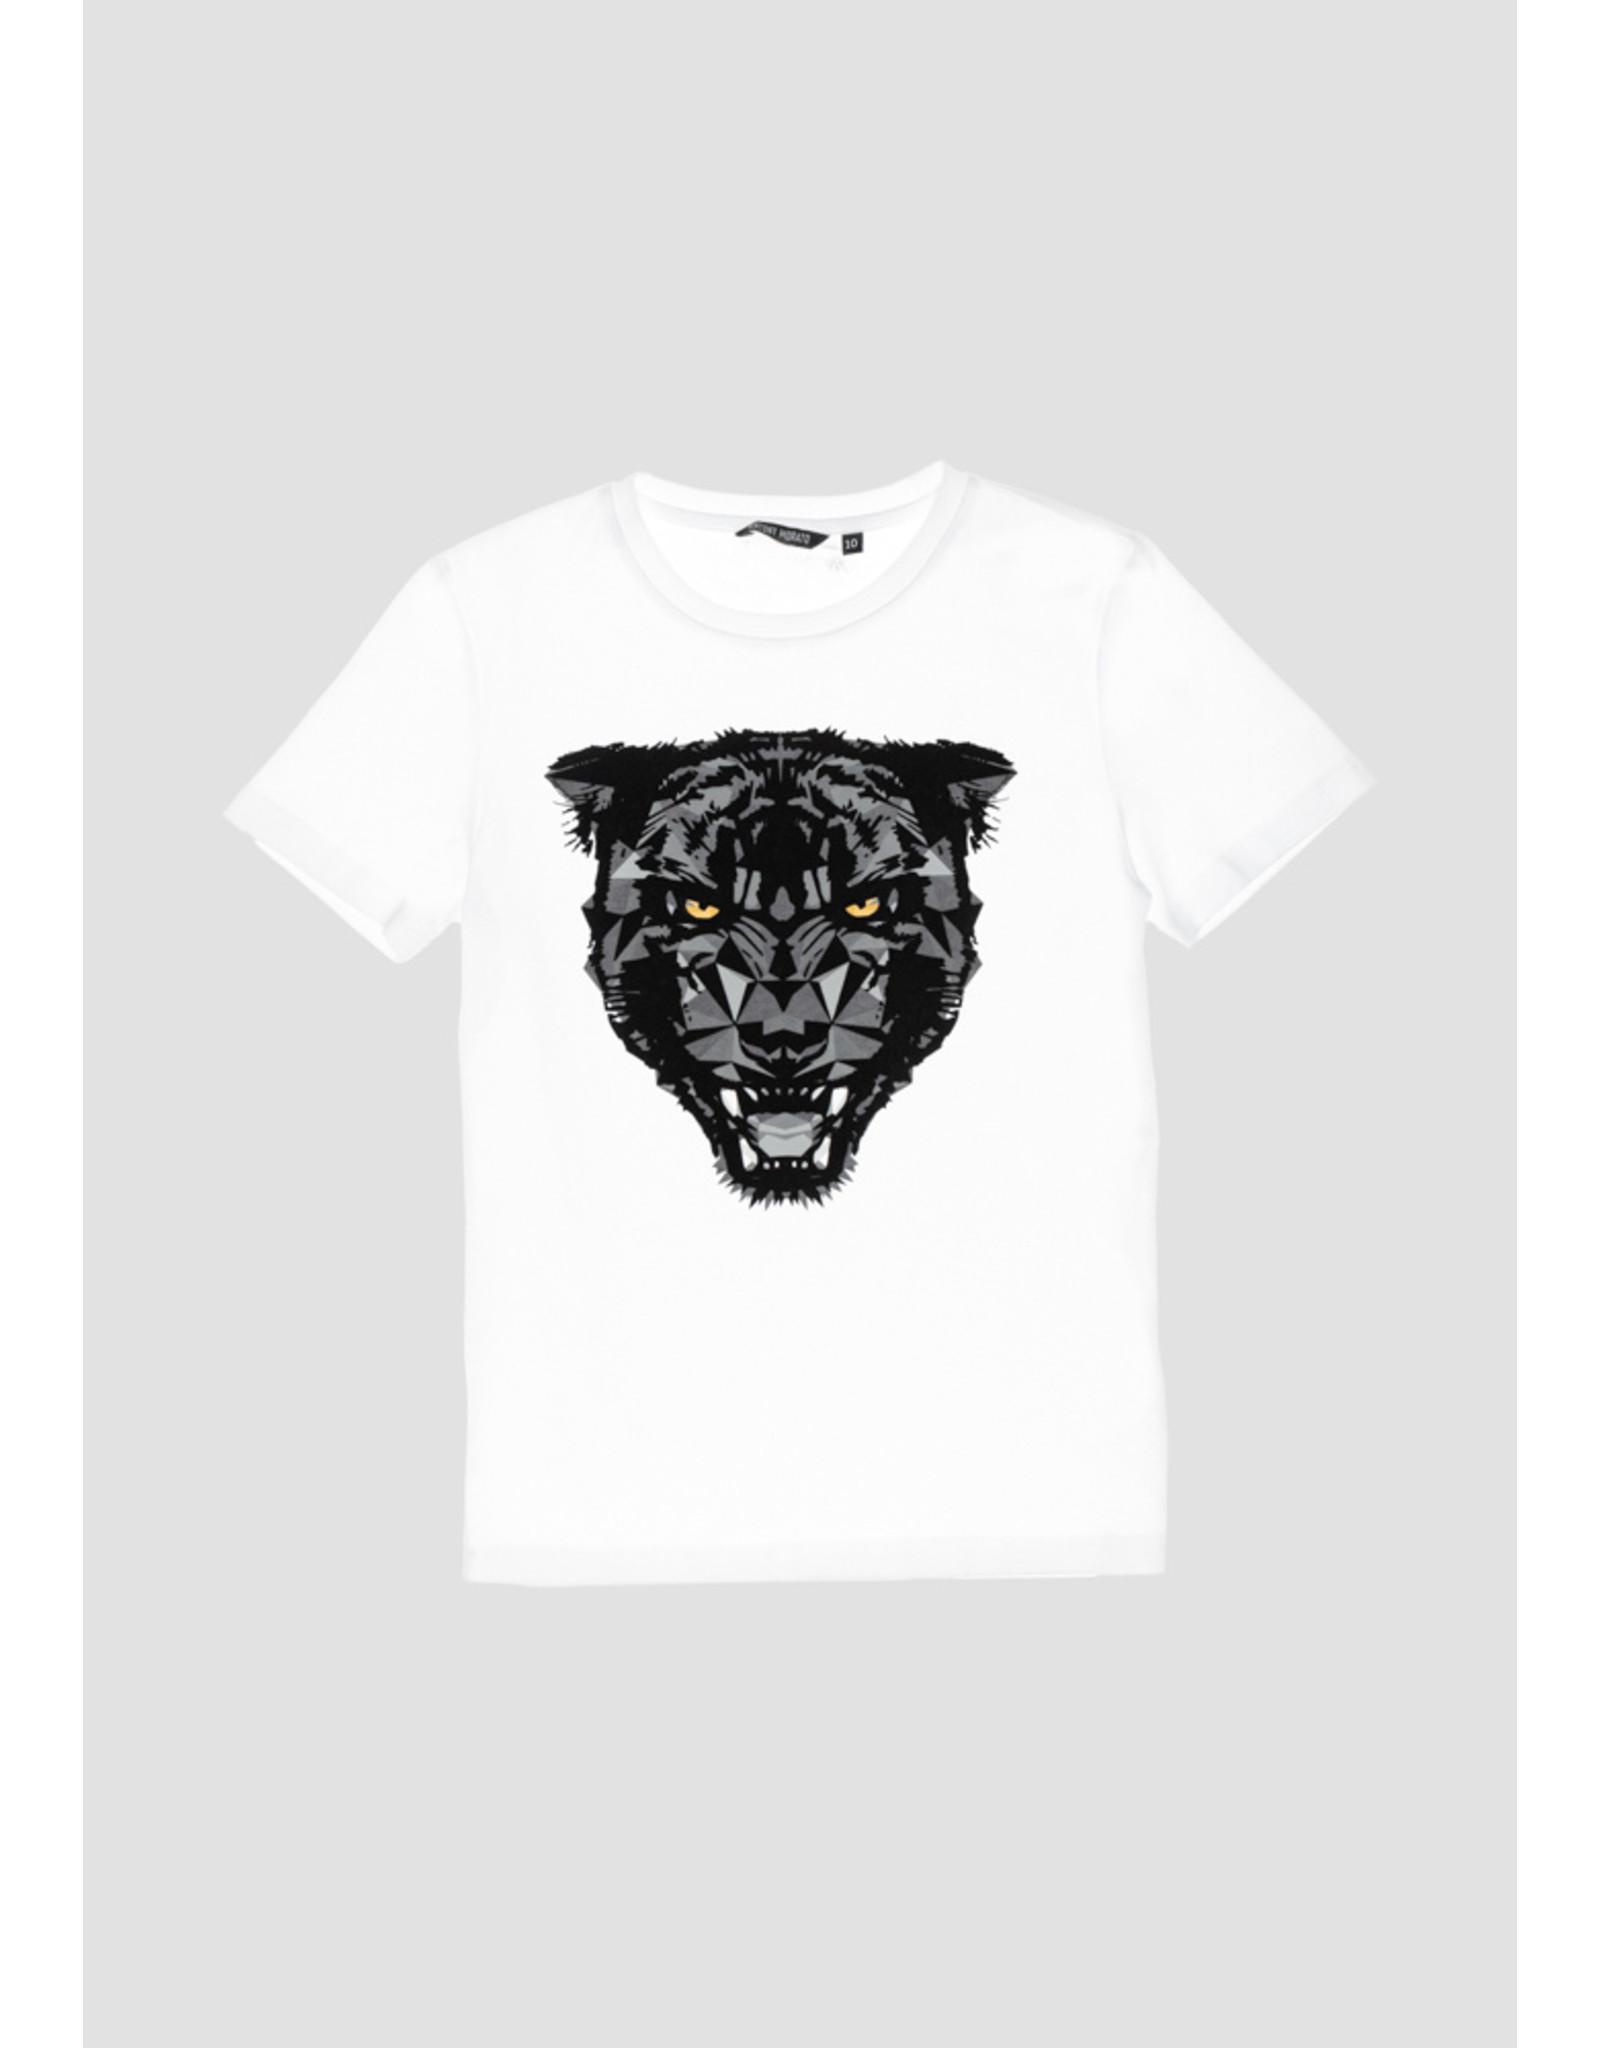 Antony Morato T-shirt wit tijger